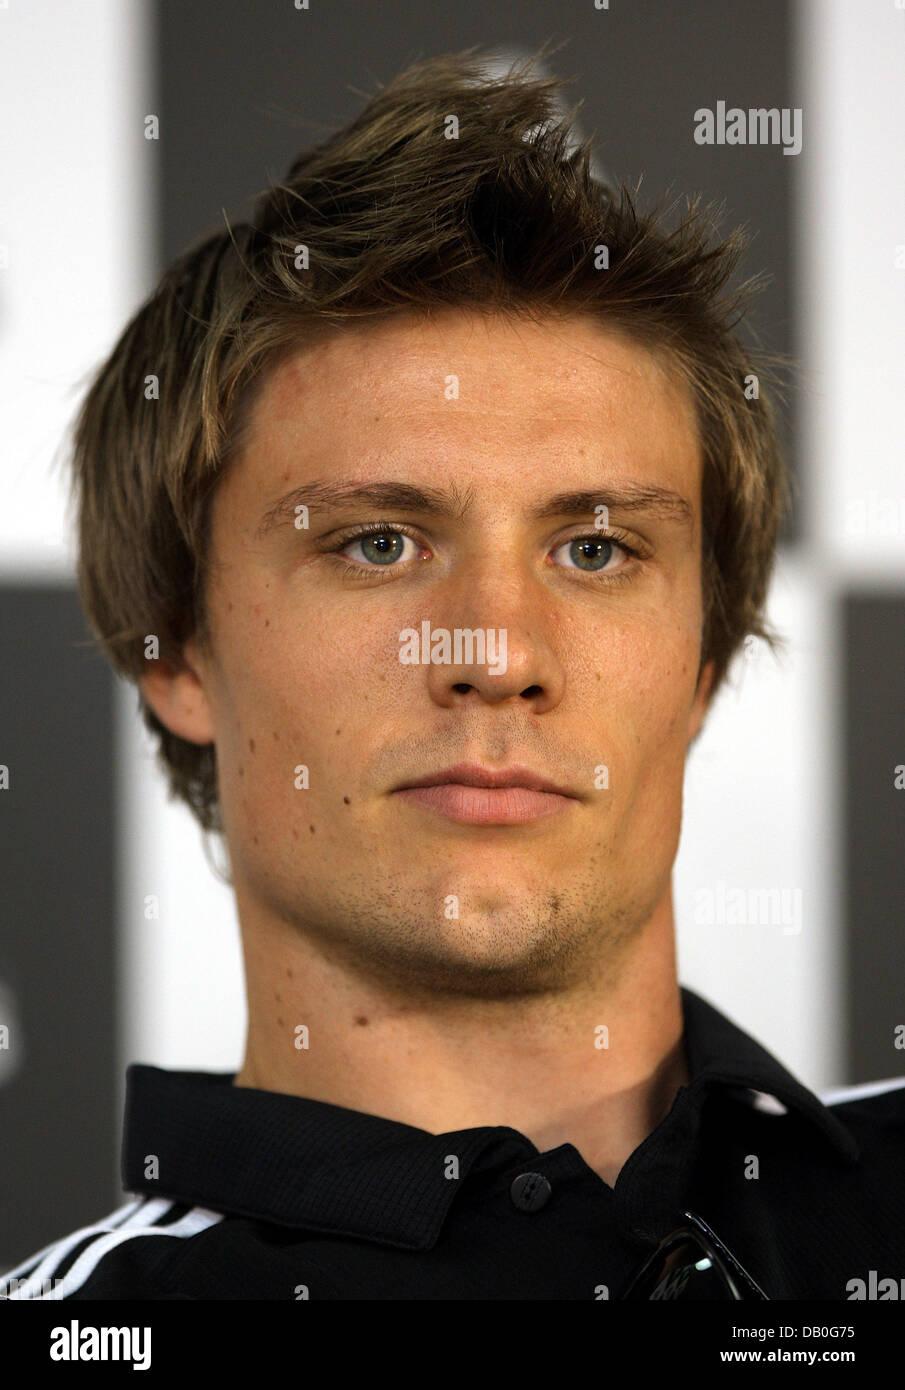 Norwegian Andreas Thorkildsen During Javelin Stock Photos ... Andreas Thorkildsen